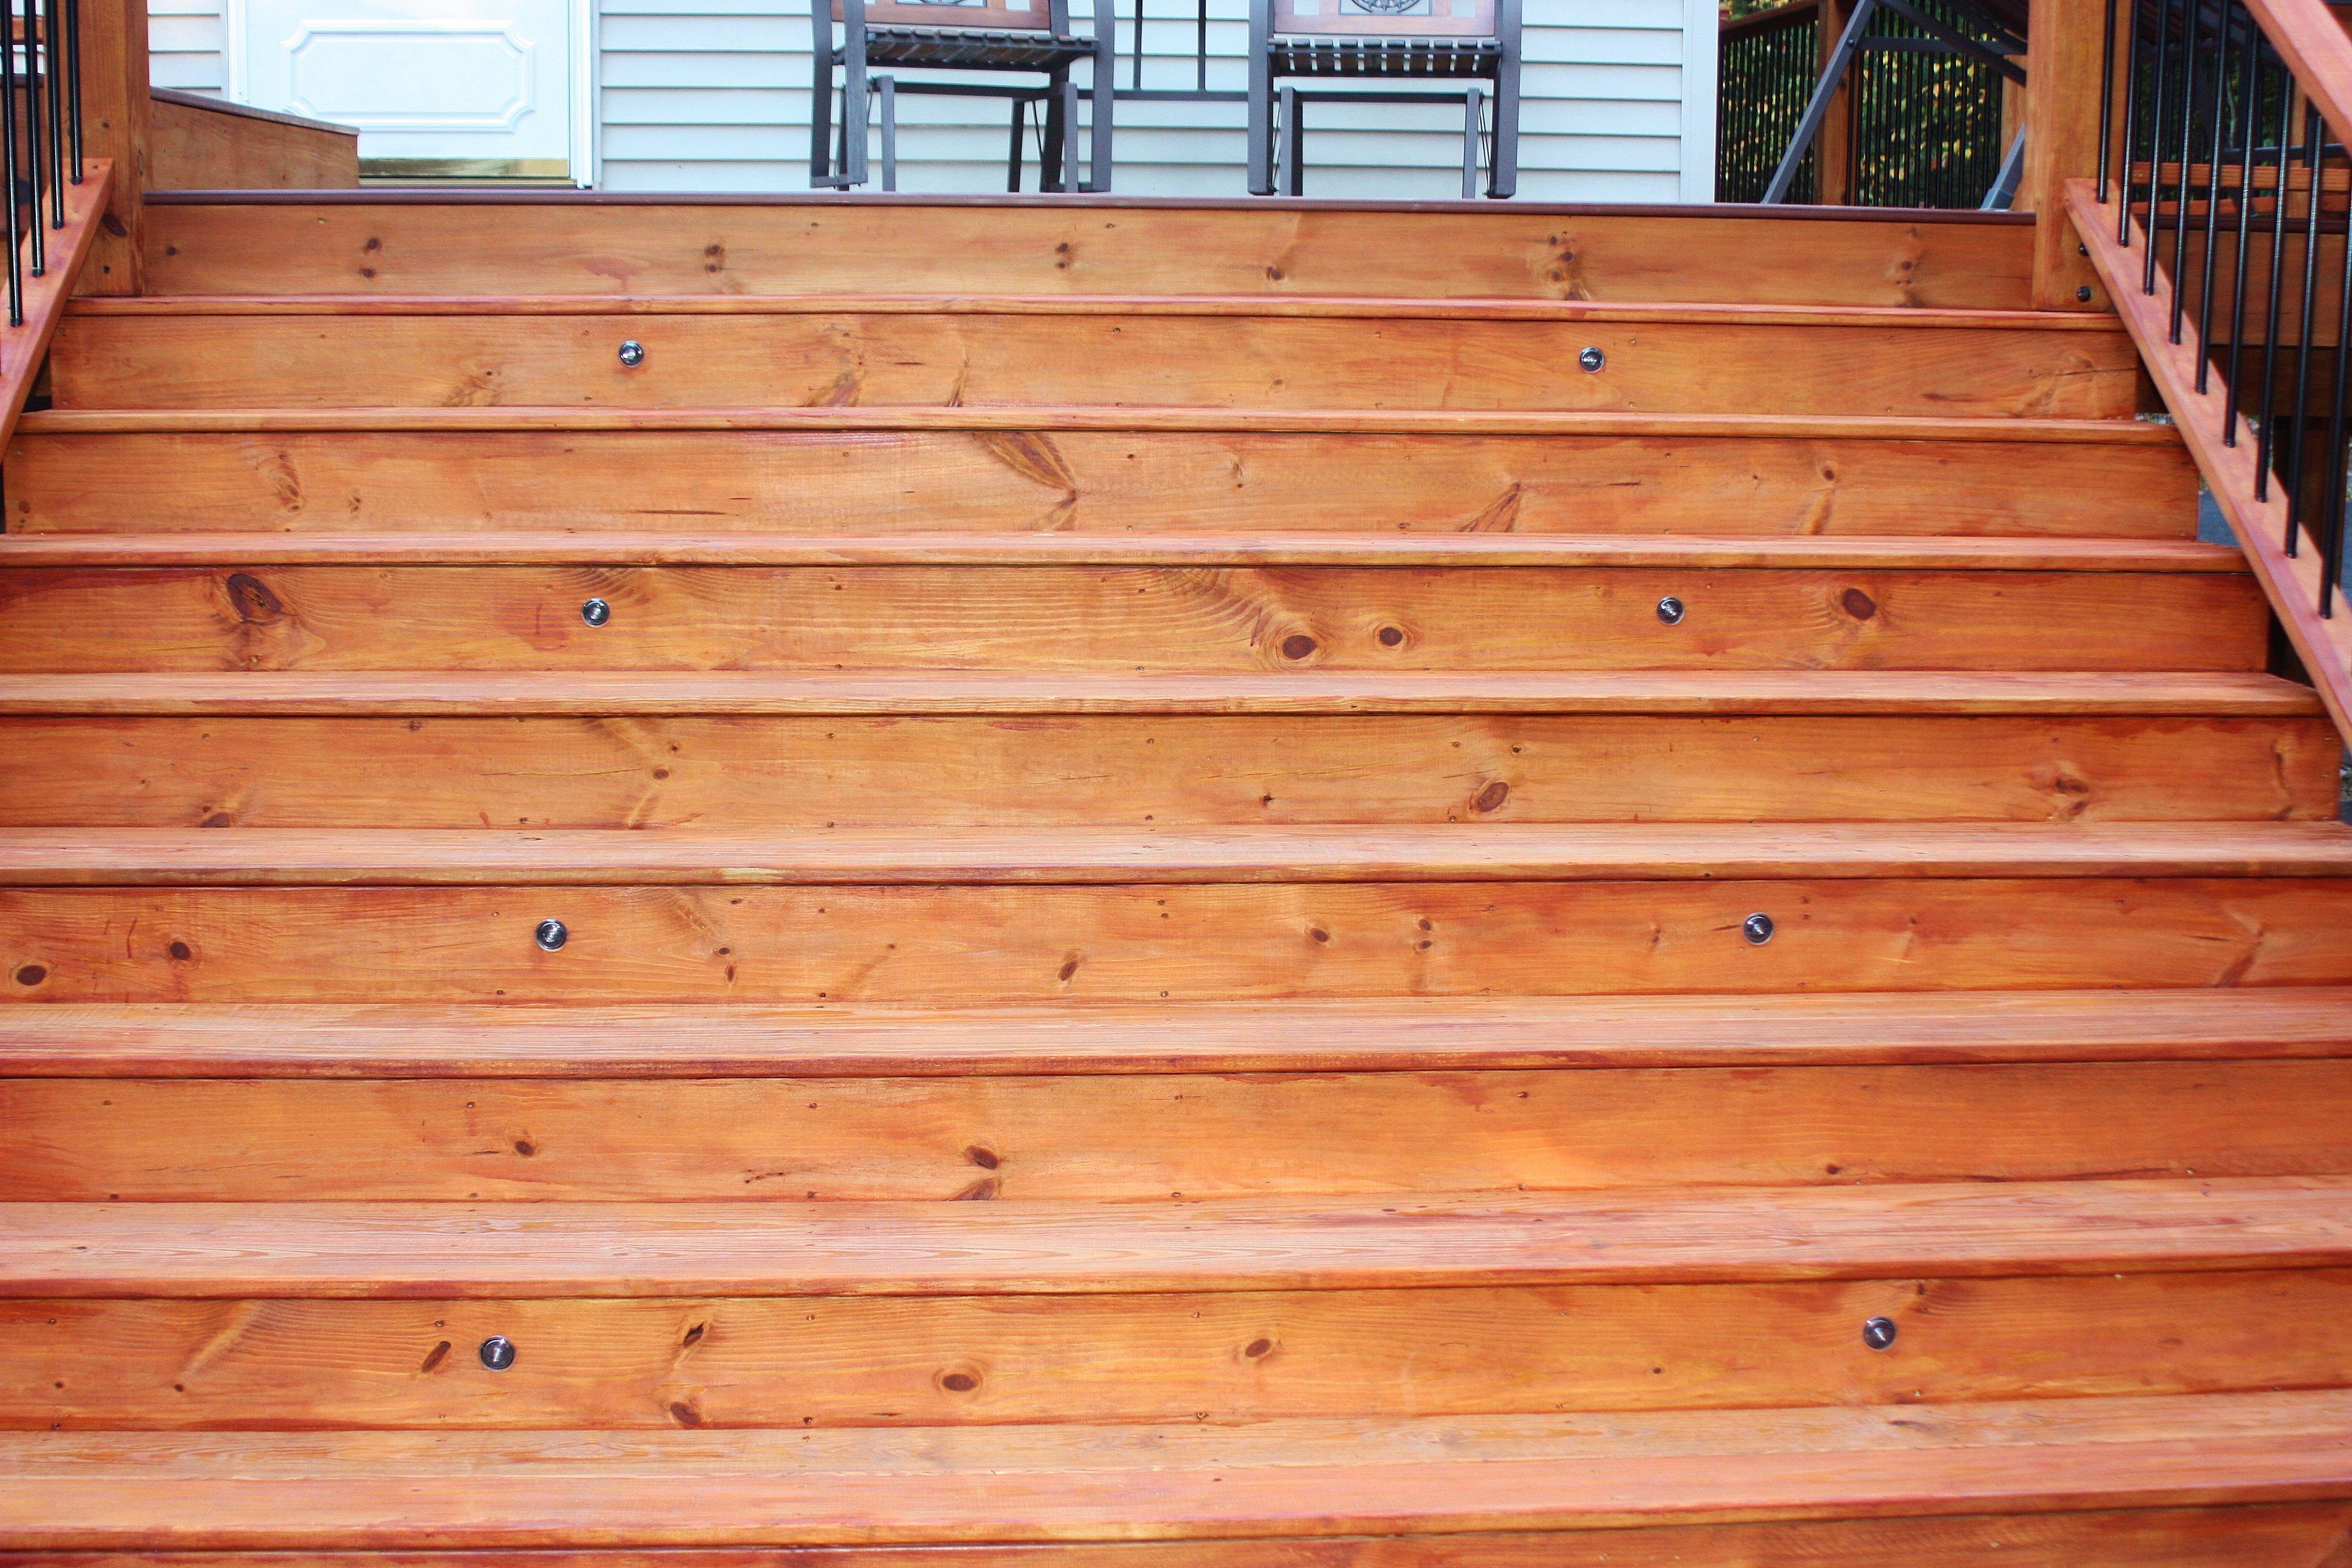 New deck with one coat of cabot 39 s australian timer oil for Australian hardwood decking